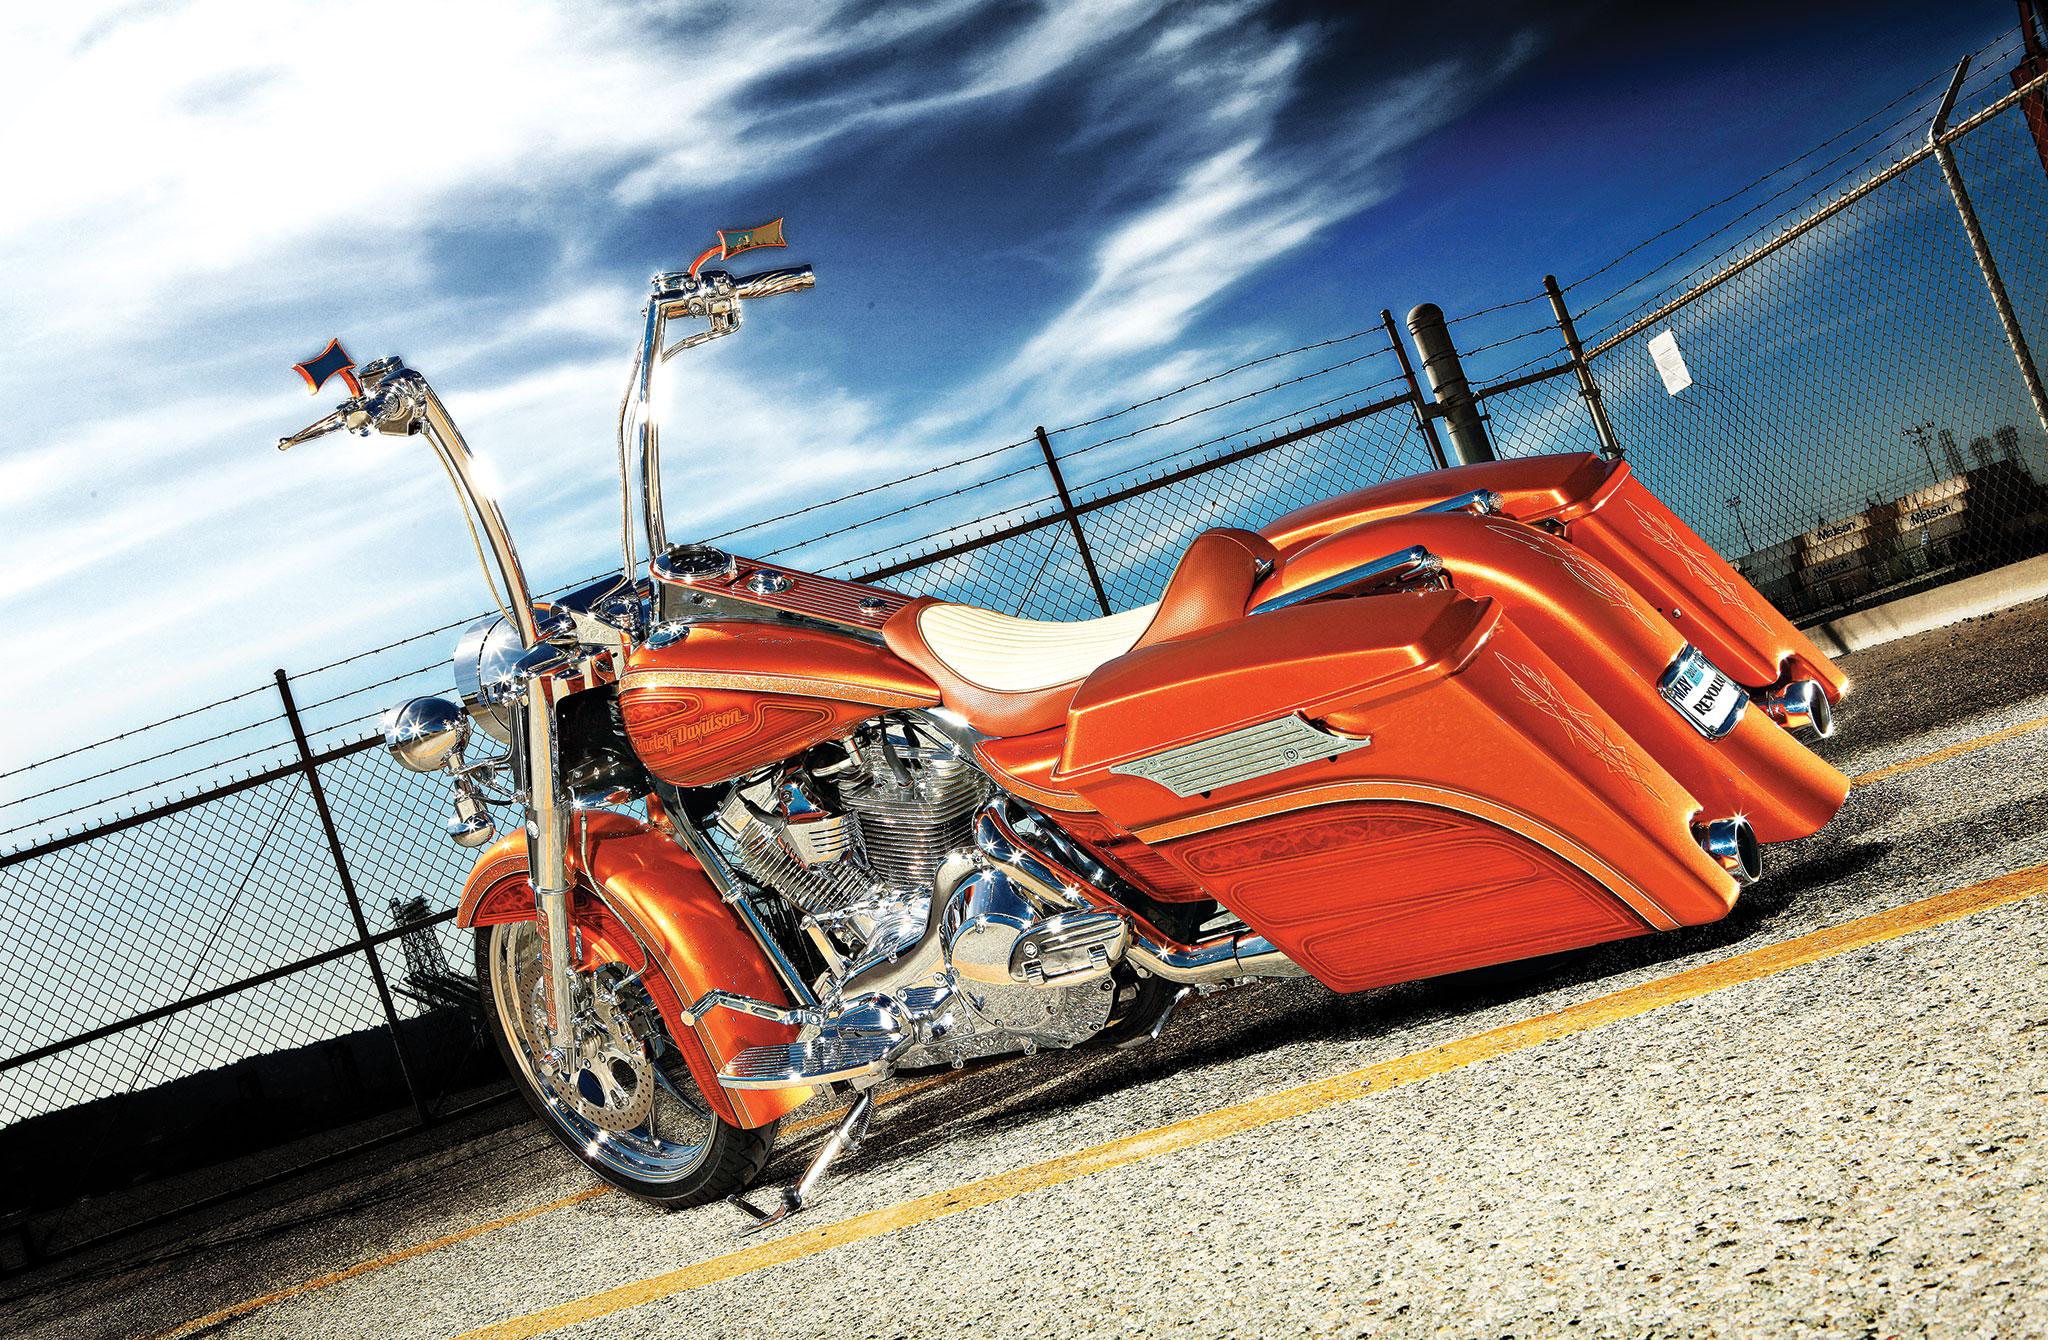 Harley Davidson All New Road King